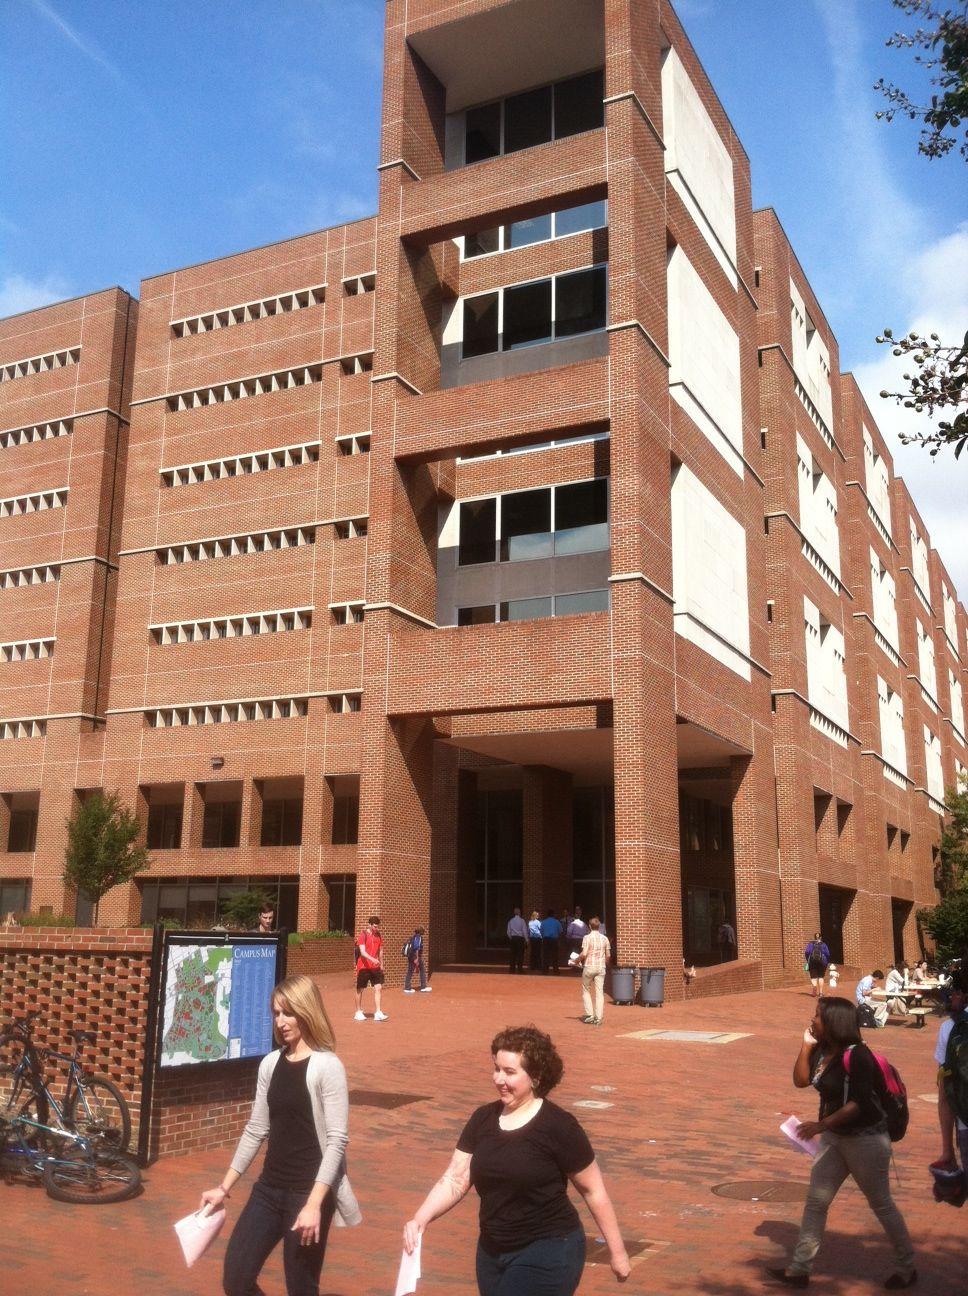 University of North Carolina/Chapel Hill/Tour Heels - Wikiversity